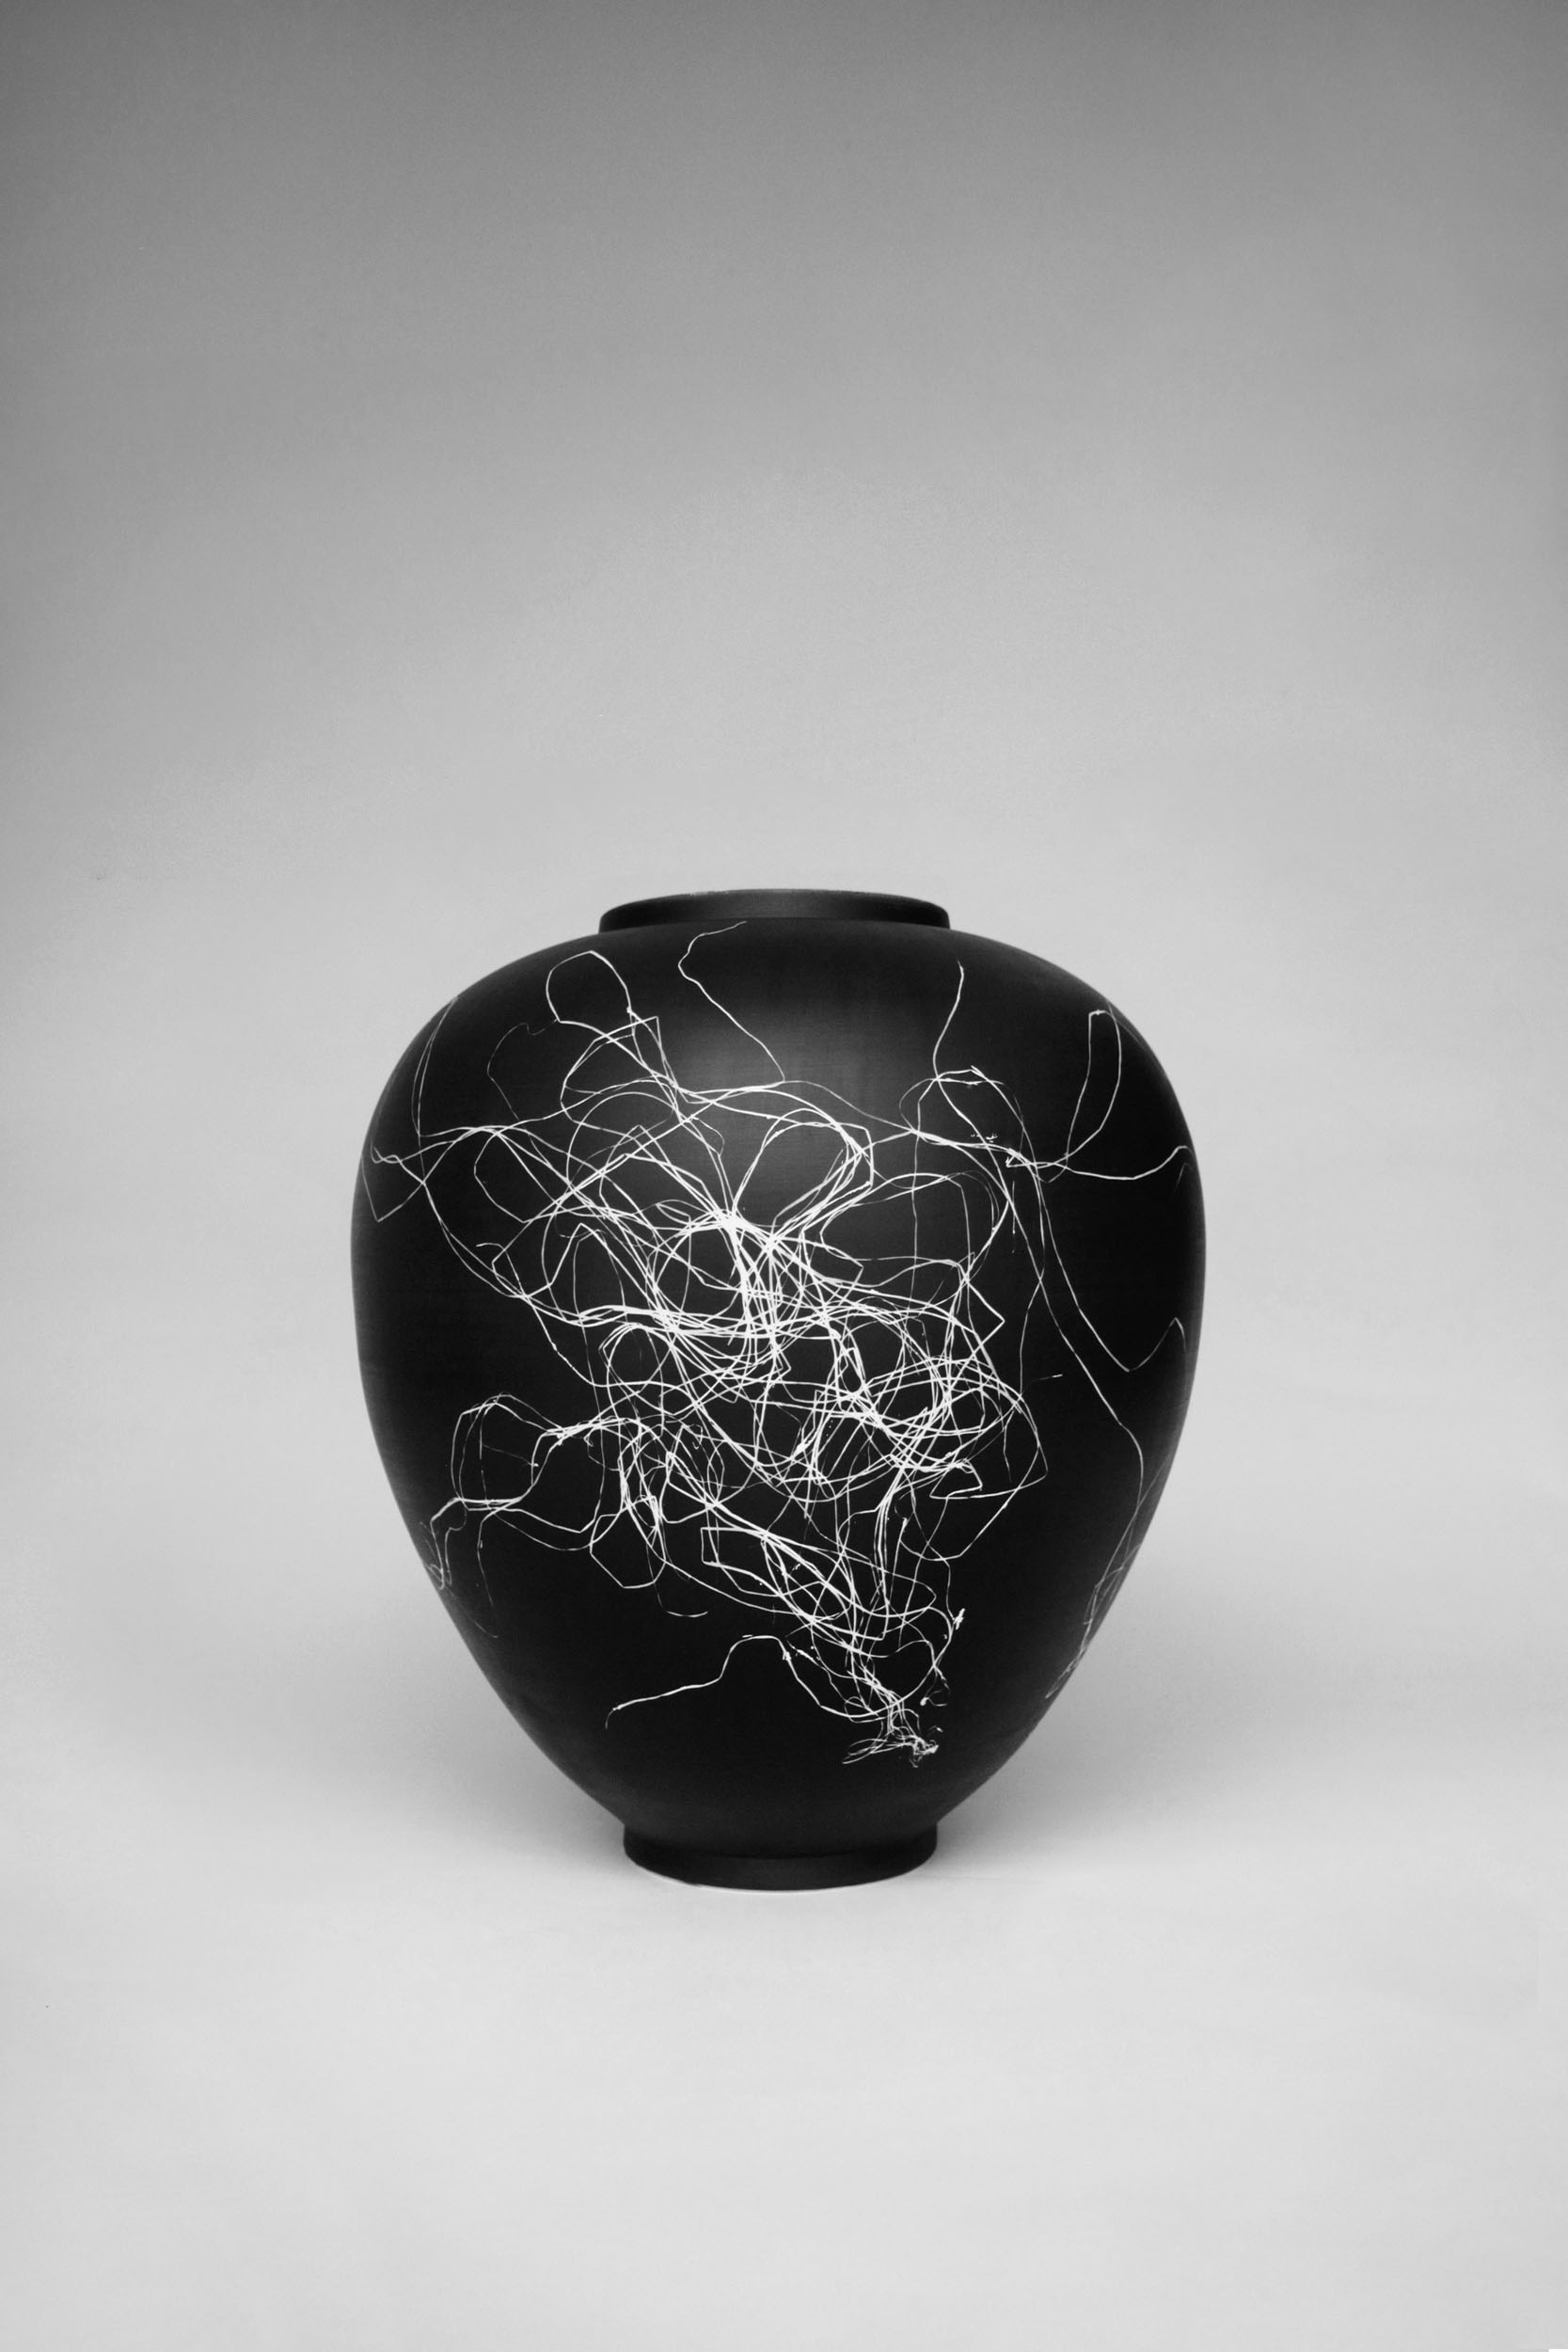 A Silverware vase with Wire Weed seaweed silver gelatin photogram